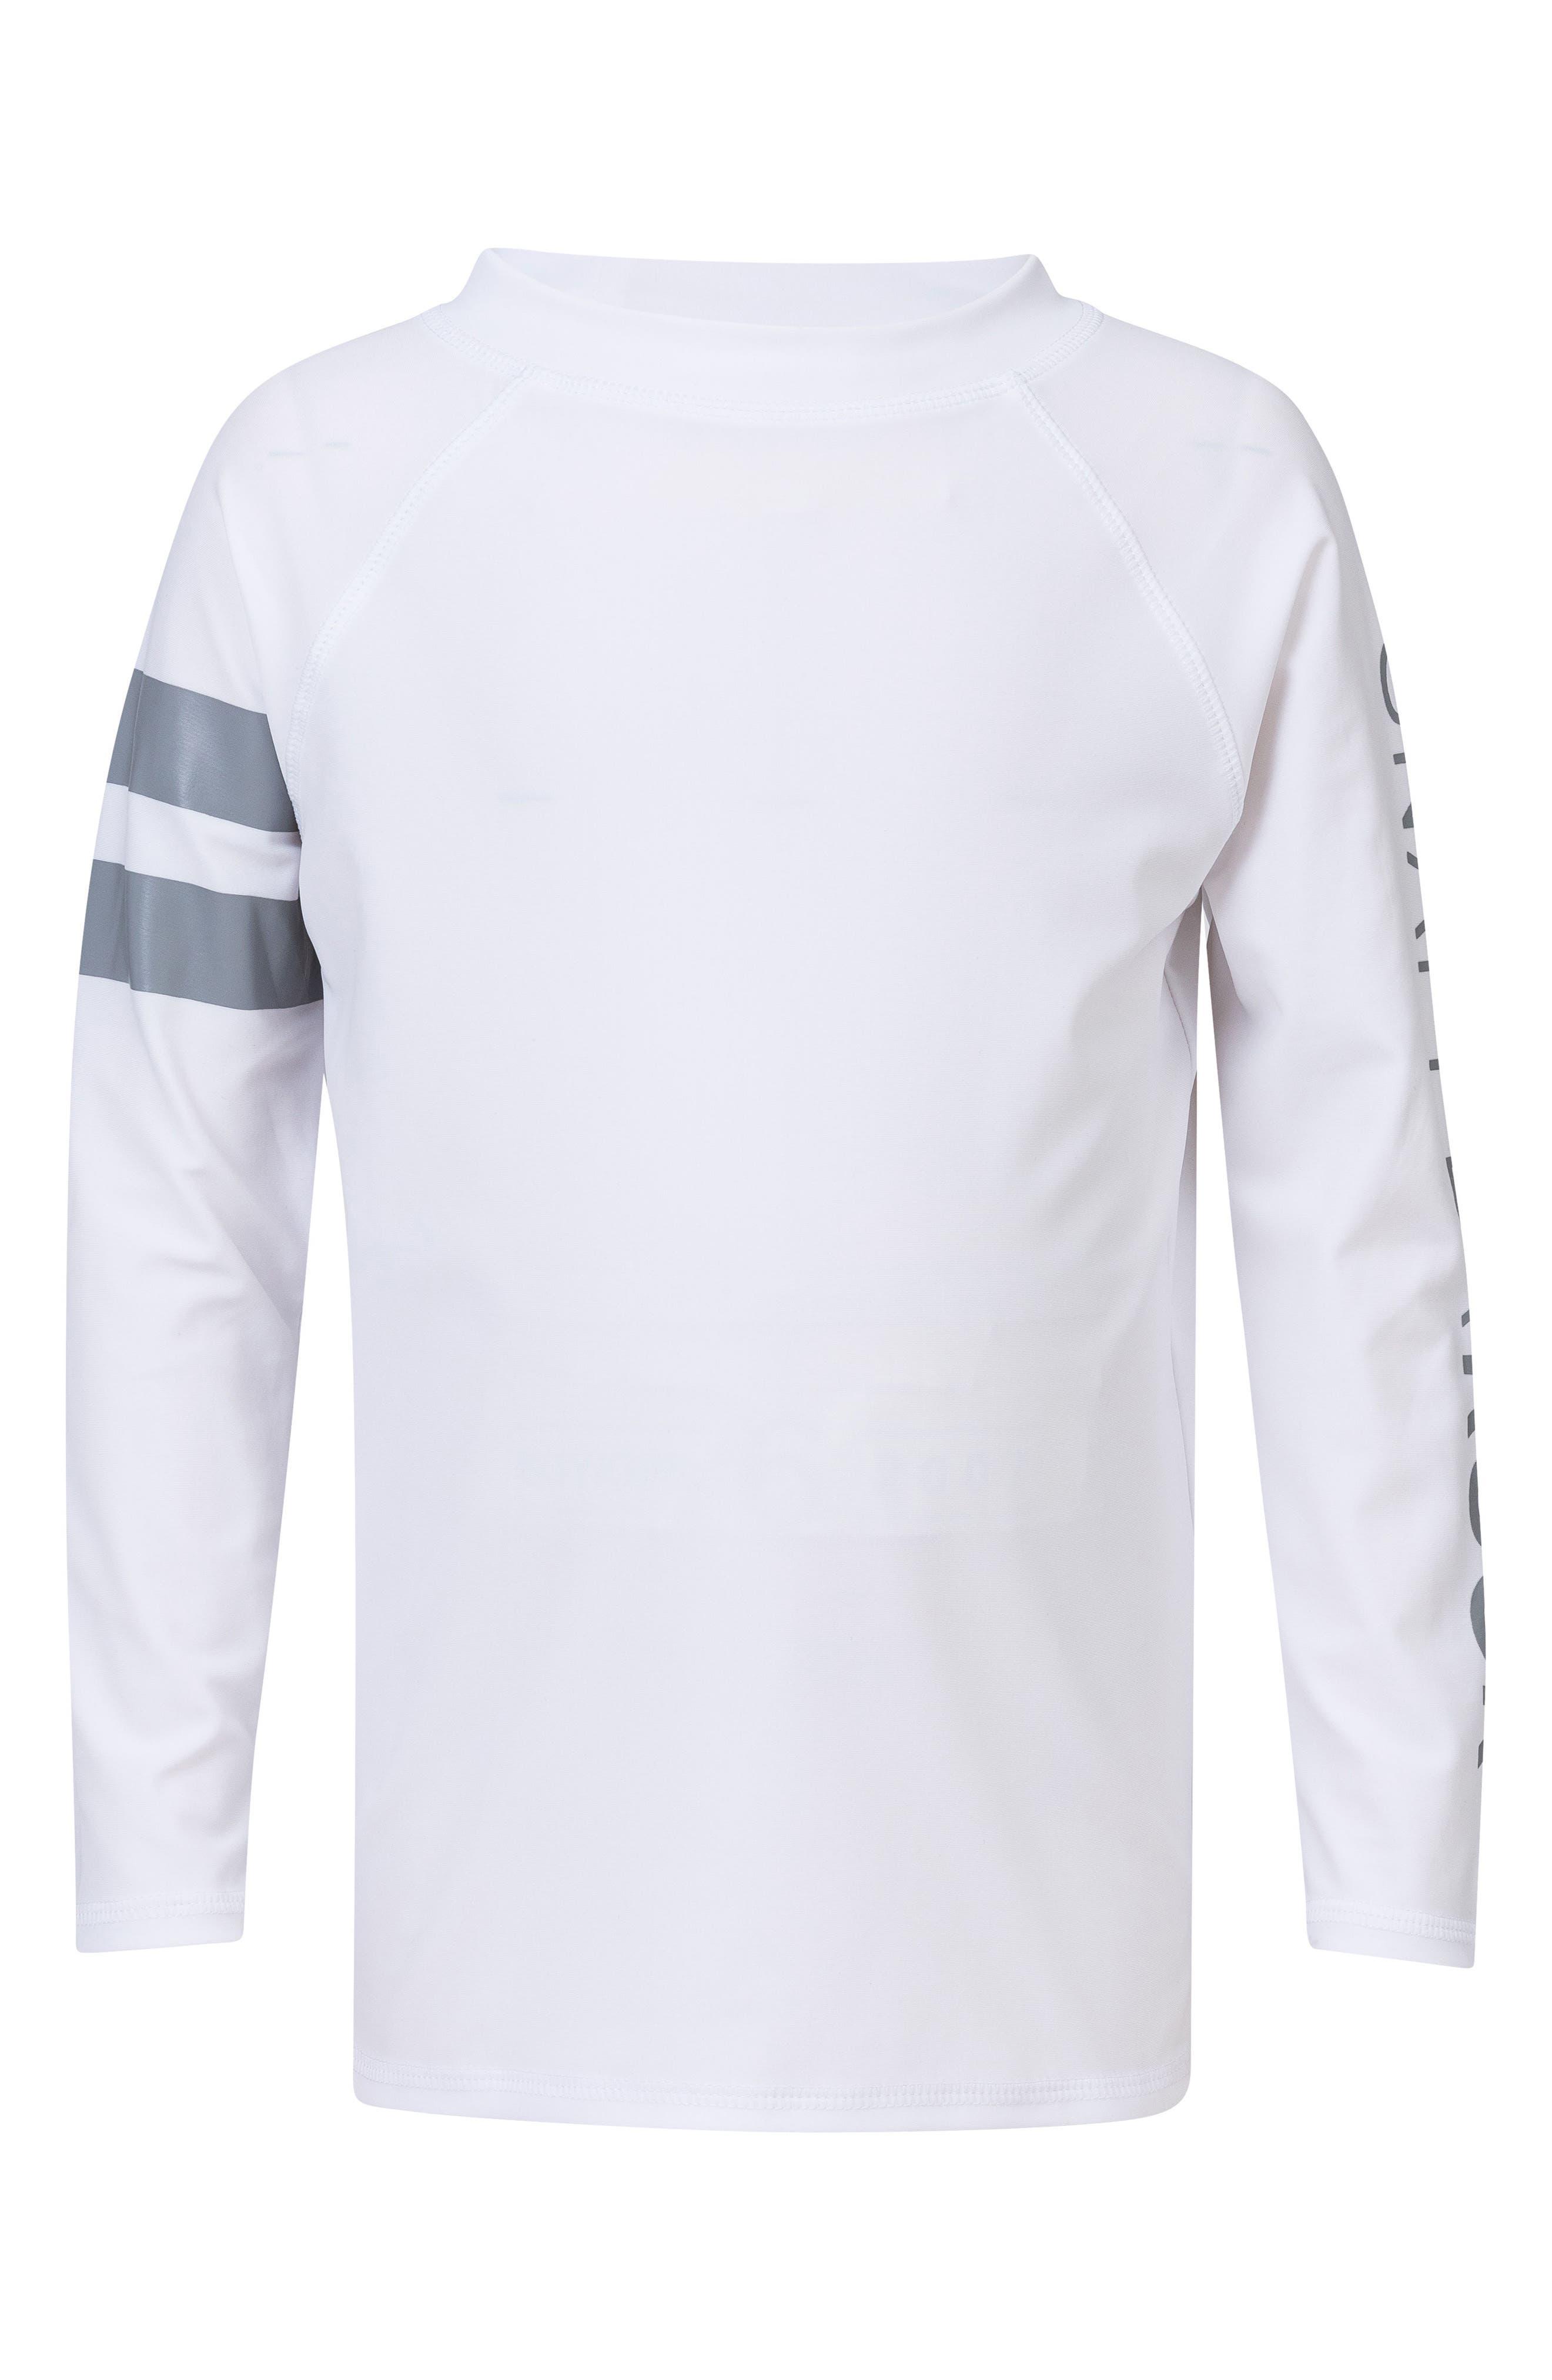 Raglan Long Sleeve Rashguard,                             Main thumbnail 1, color,                             White/ Grey